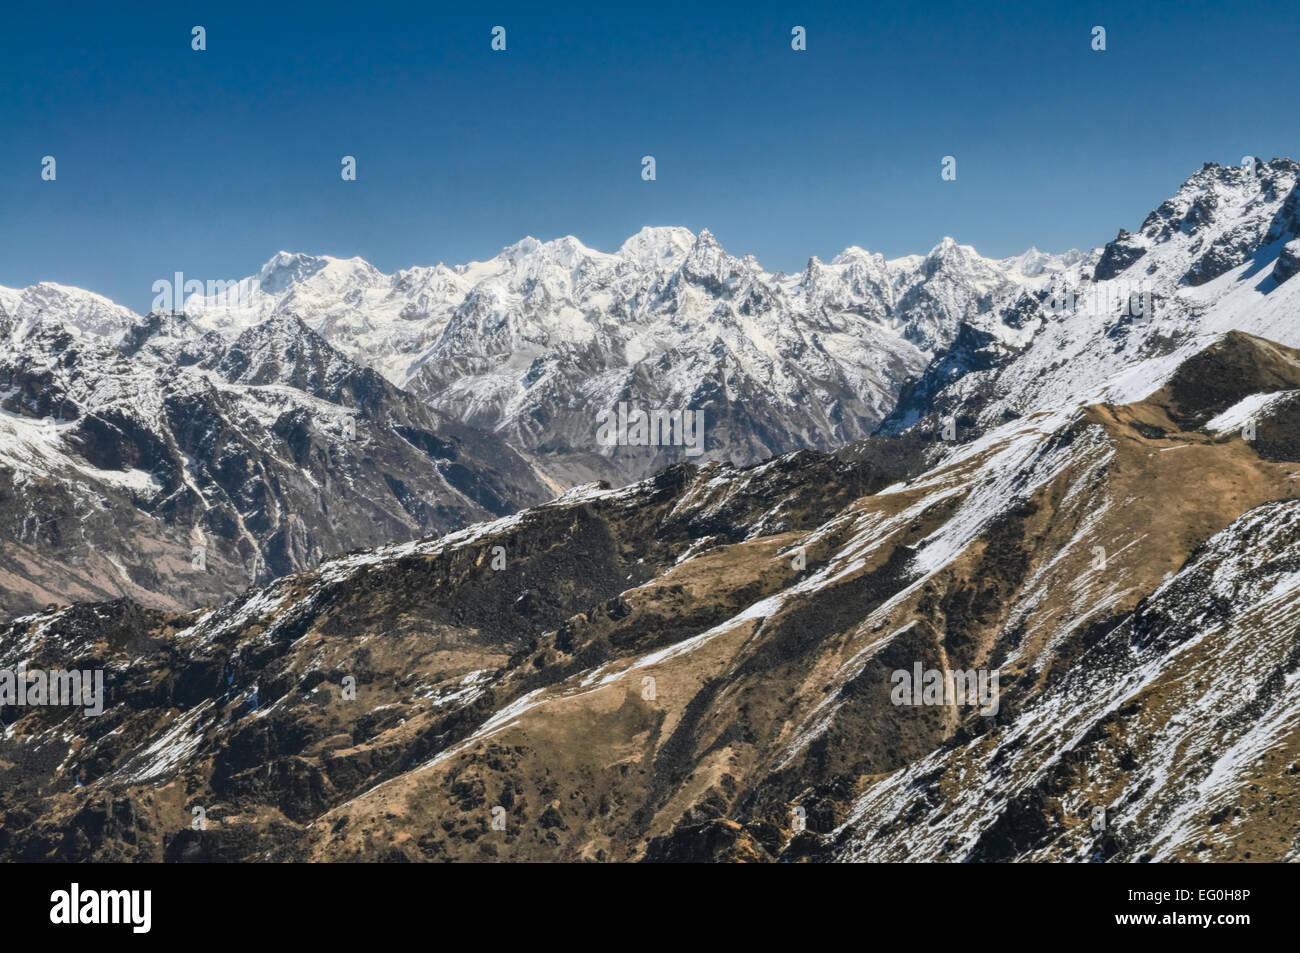 Panoramablick ins Tal abfallenden Berge Stockbild